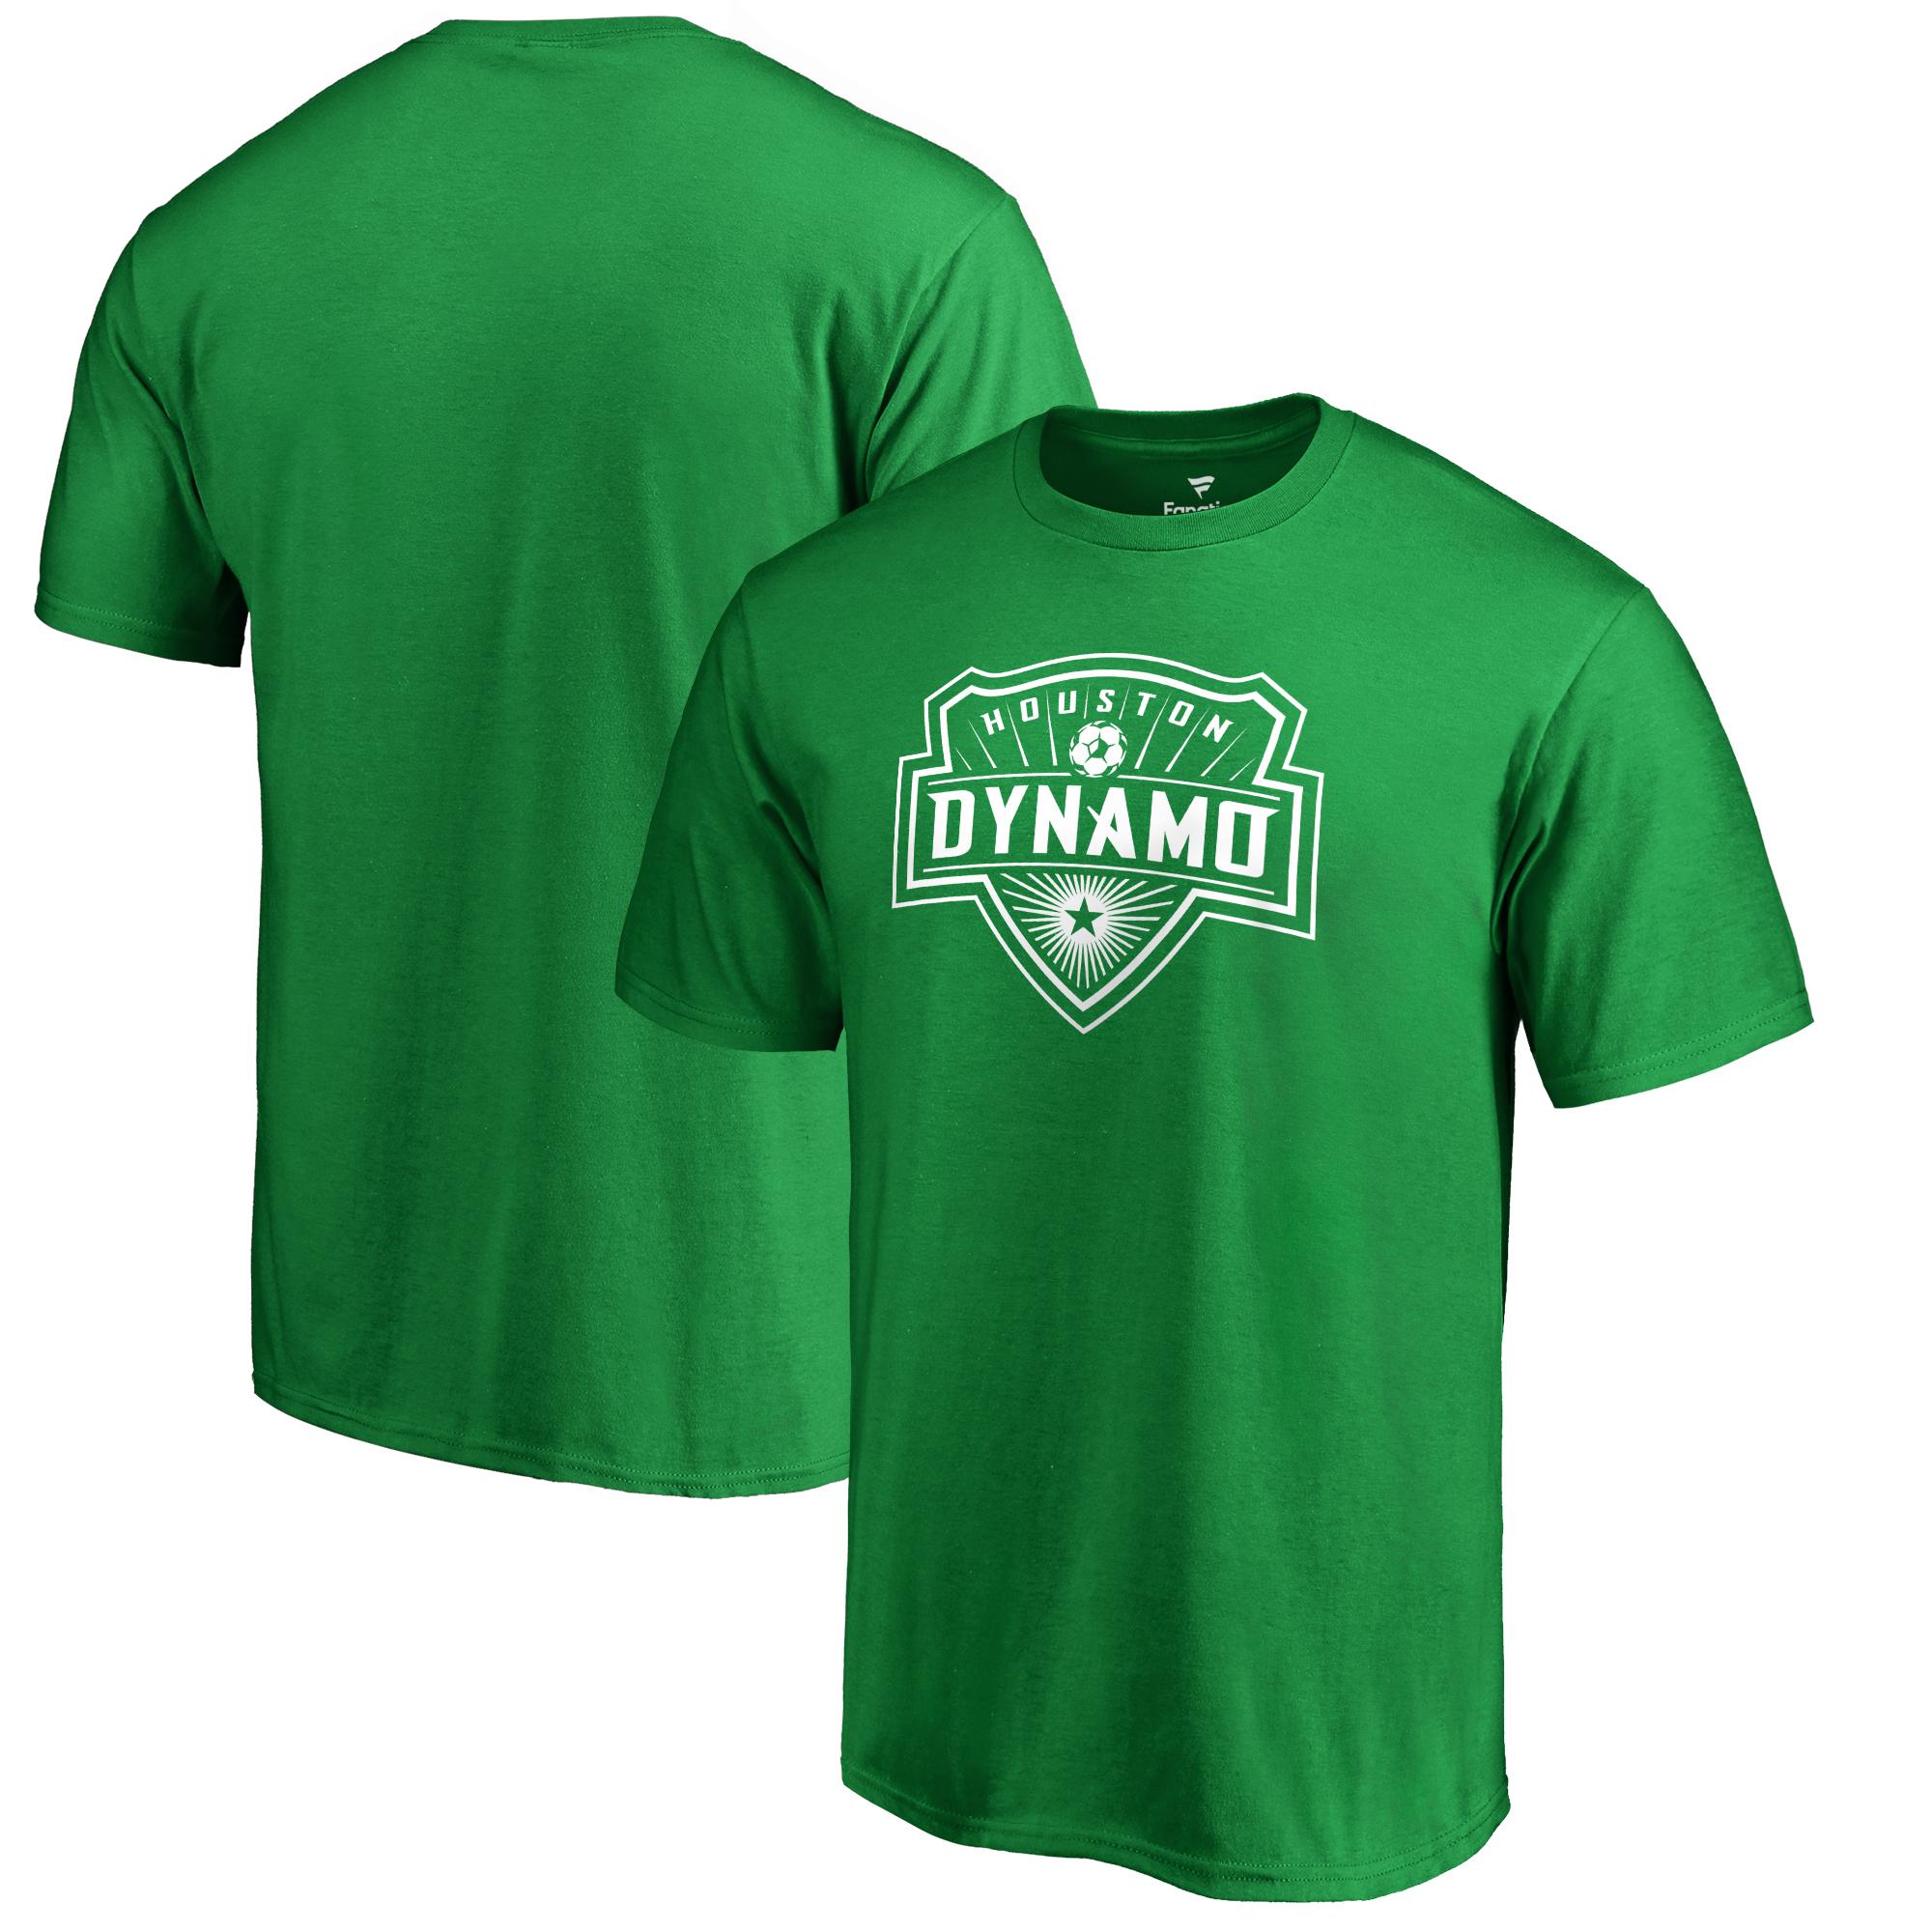 Houston Dynamo Fanatics Branded St. Patrick's Day White Logo T-Shirt - Kelly Green